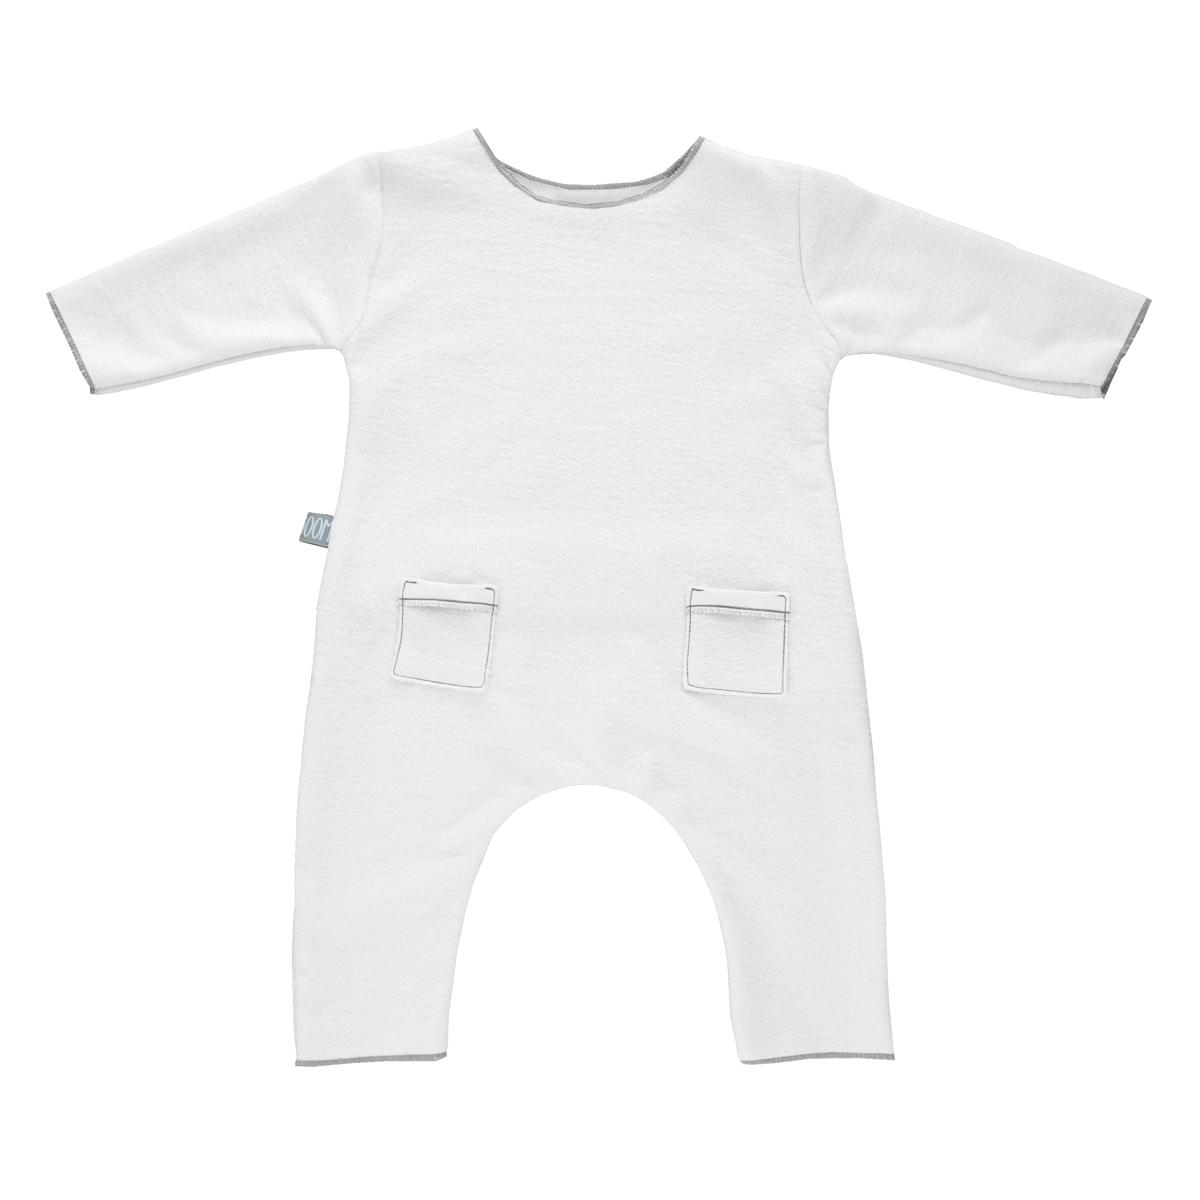 Robe & combinaison Combinaison Blanc - 6 Mois Combinaison Blanc - 6 Mois